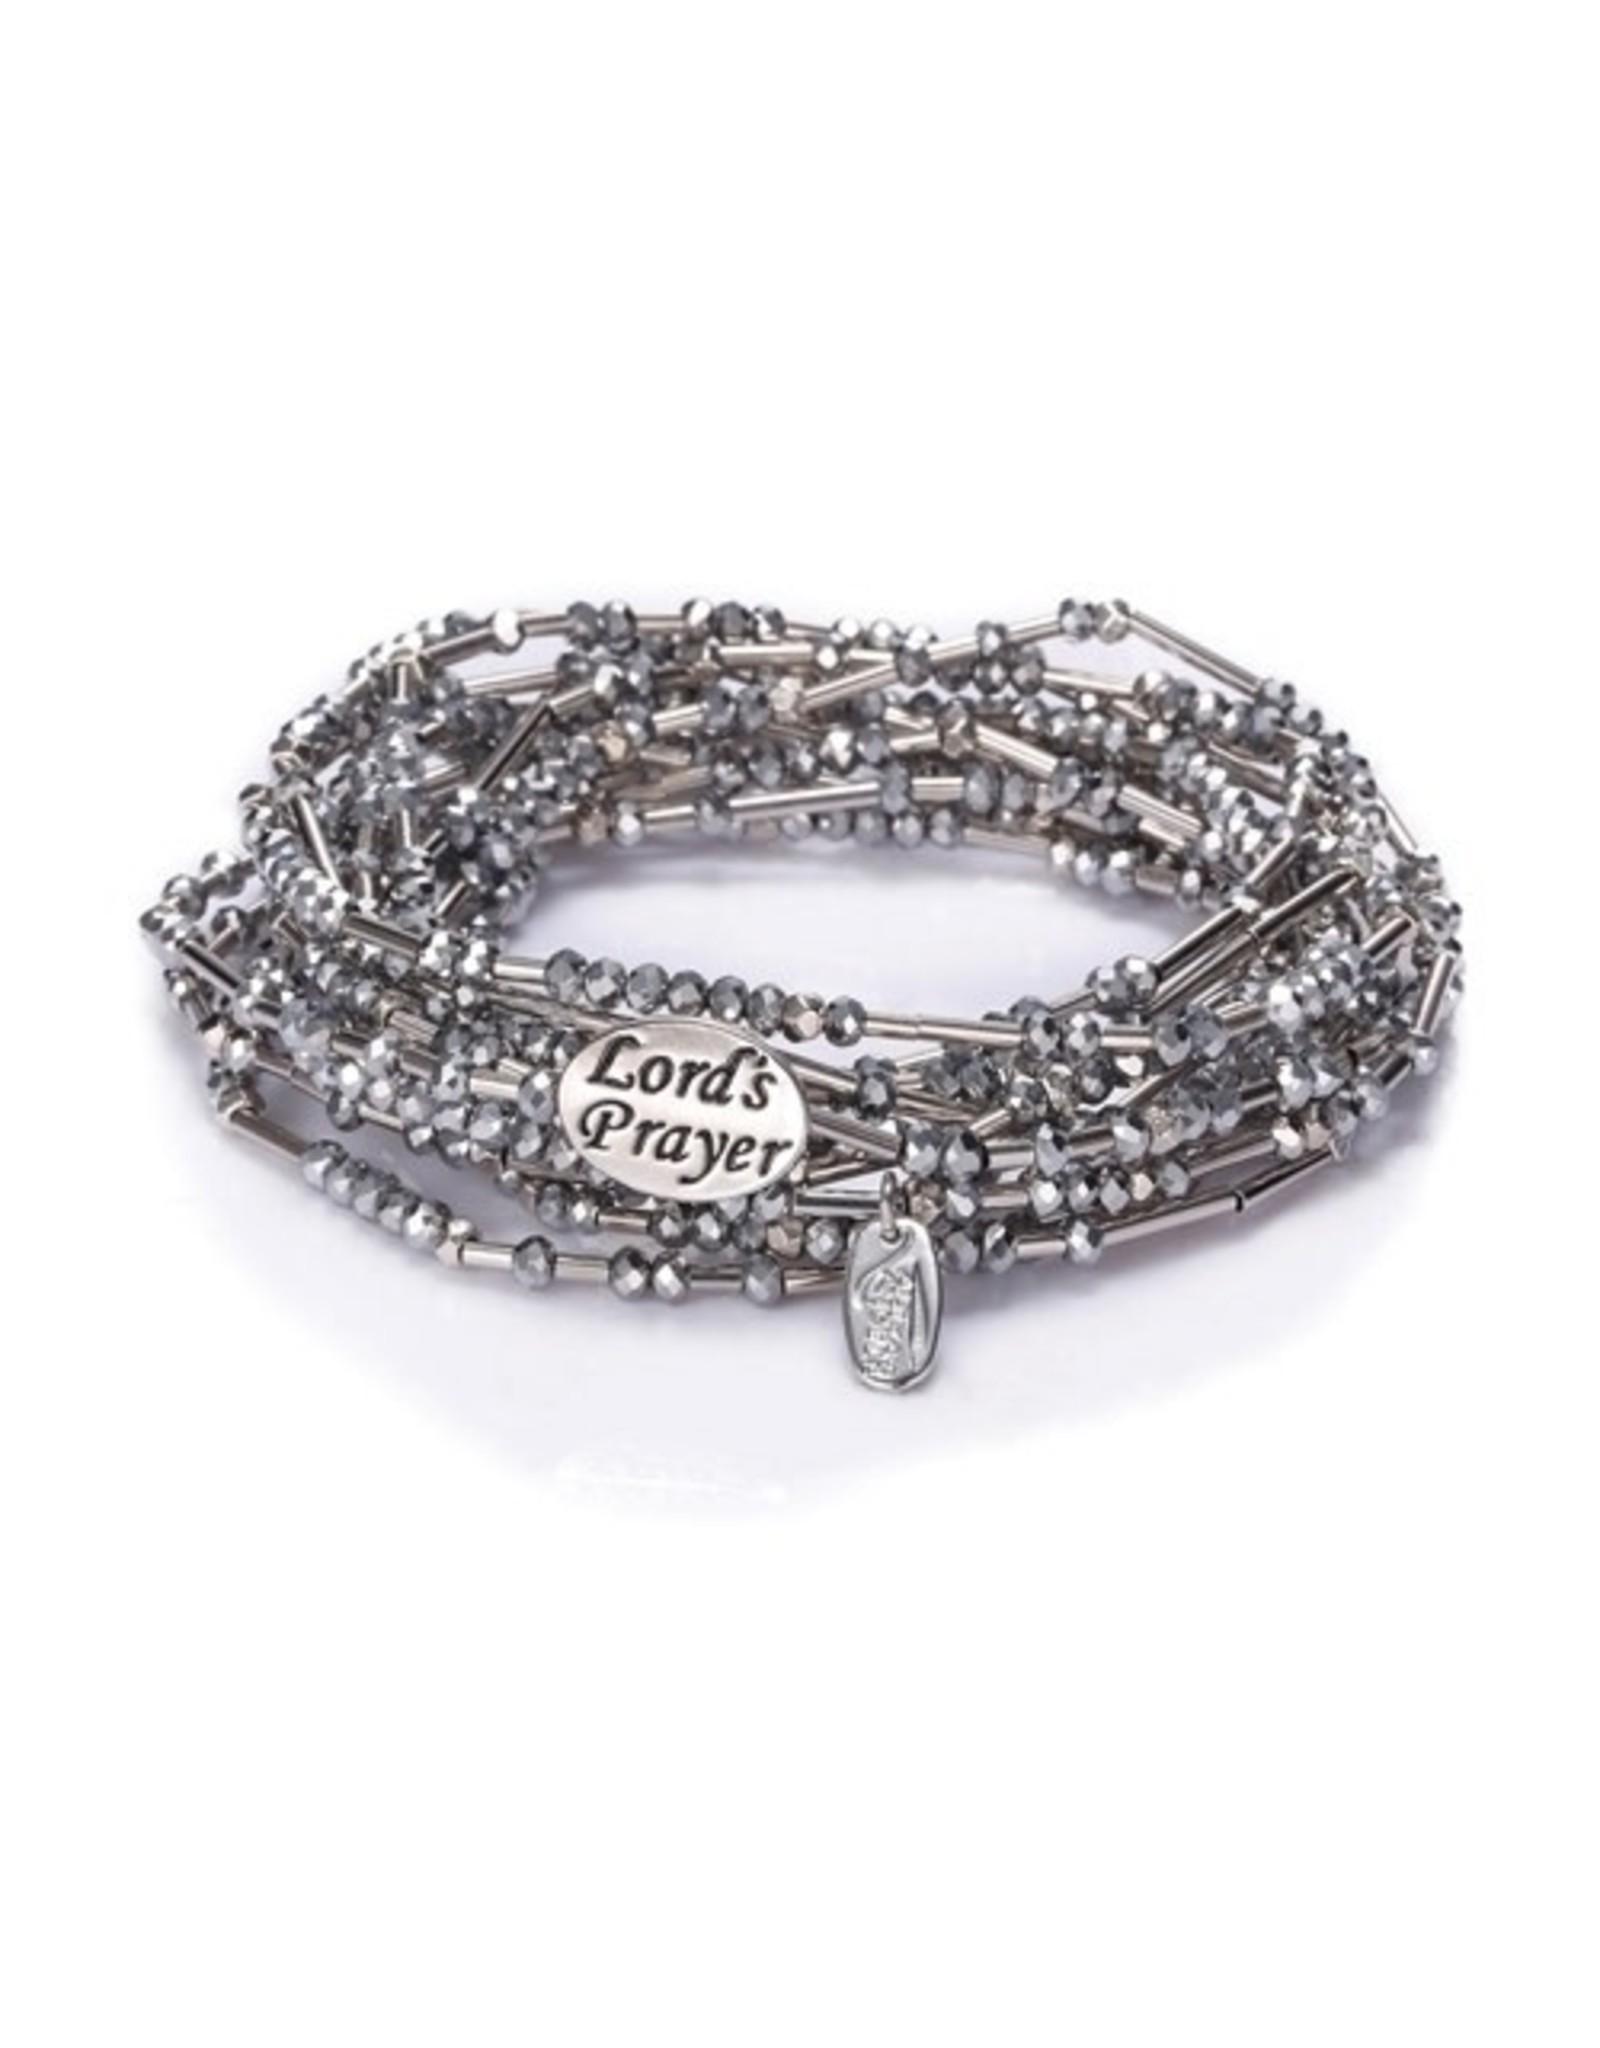 Lord's Prayer Morse Code Bracelet